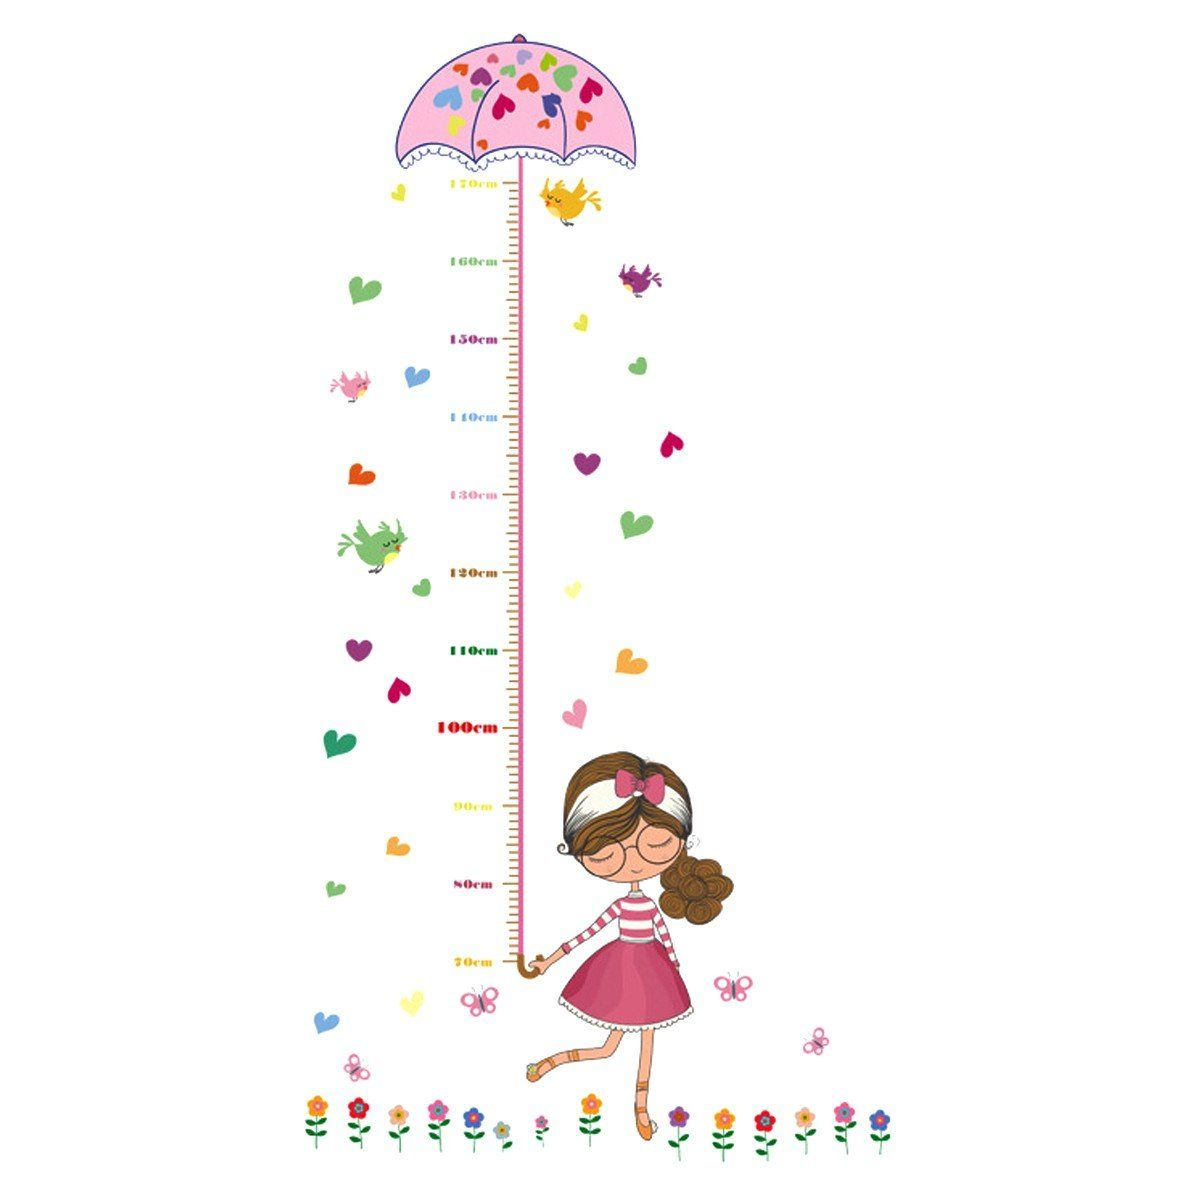 Uniquebella pvc height measurement growth chart for child kid uniquebella pvc height measurement growth chart for child kid removable nursery wall art decals stickers cartoon geenschuldenfo Gallery